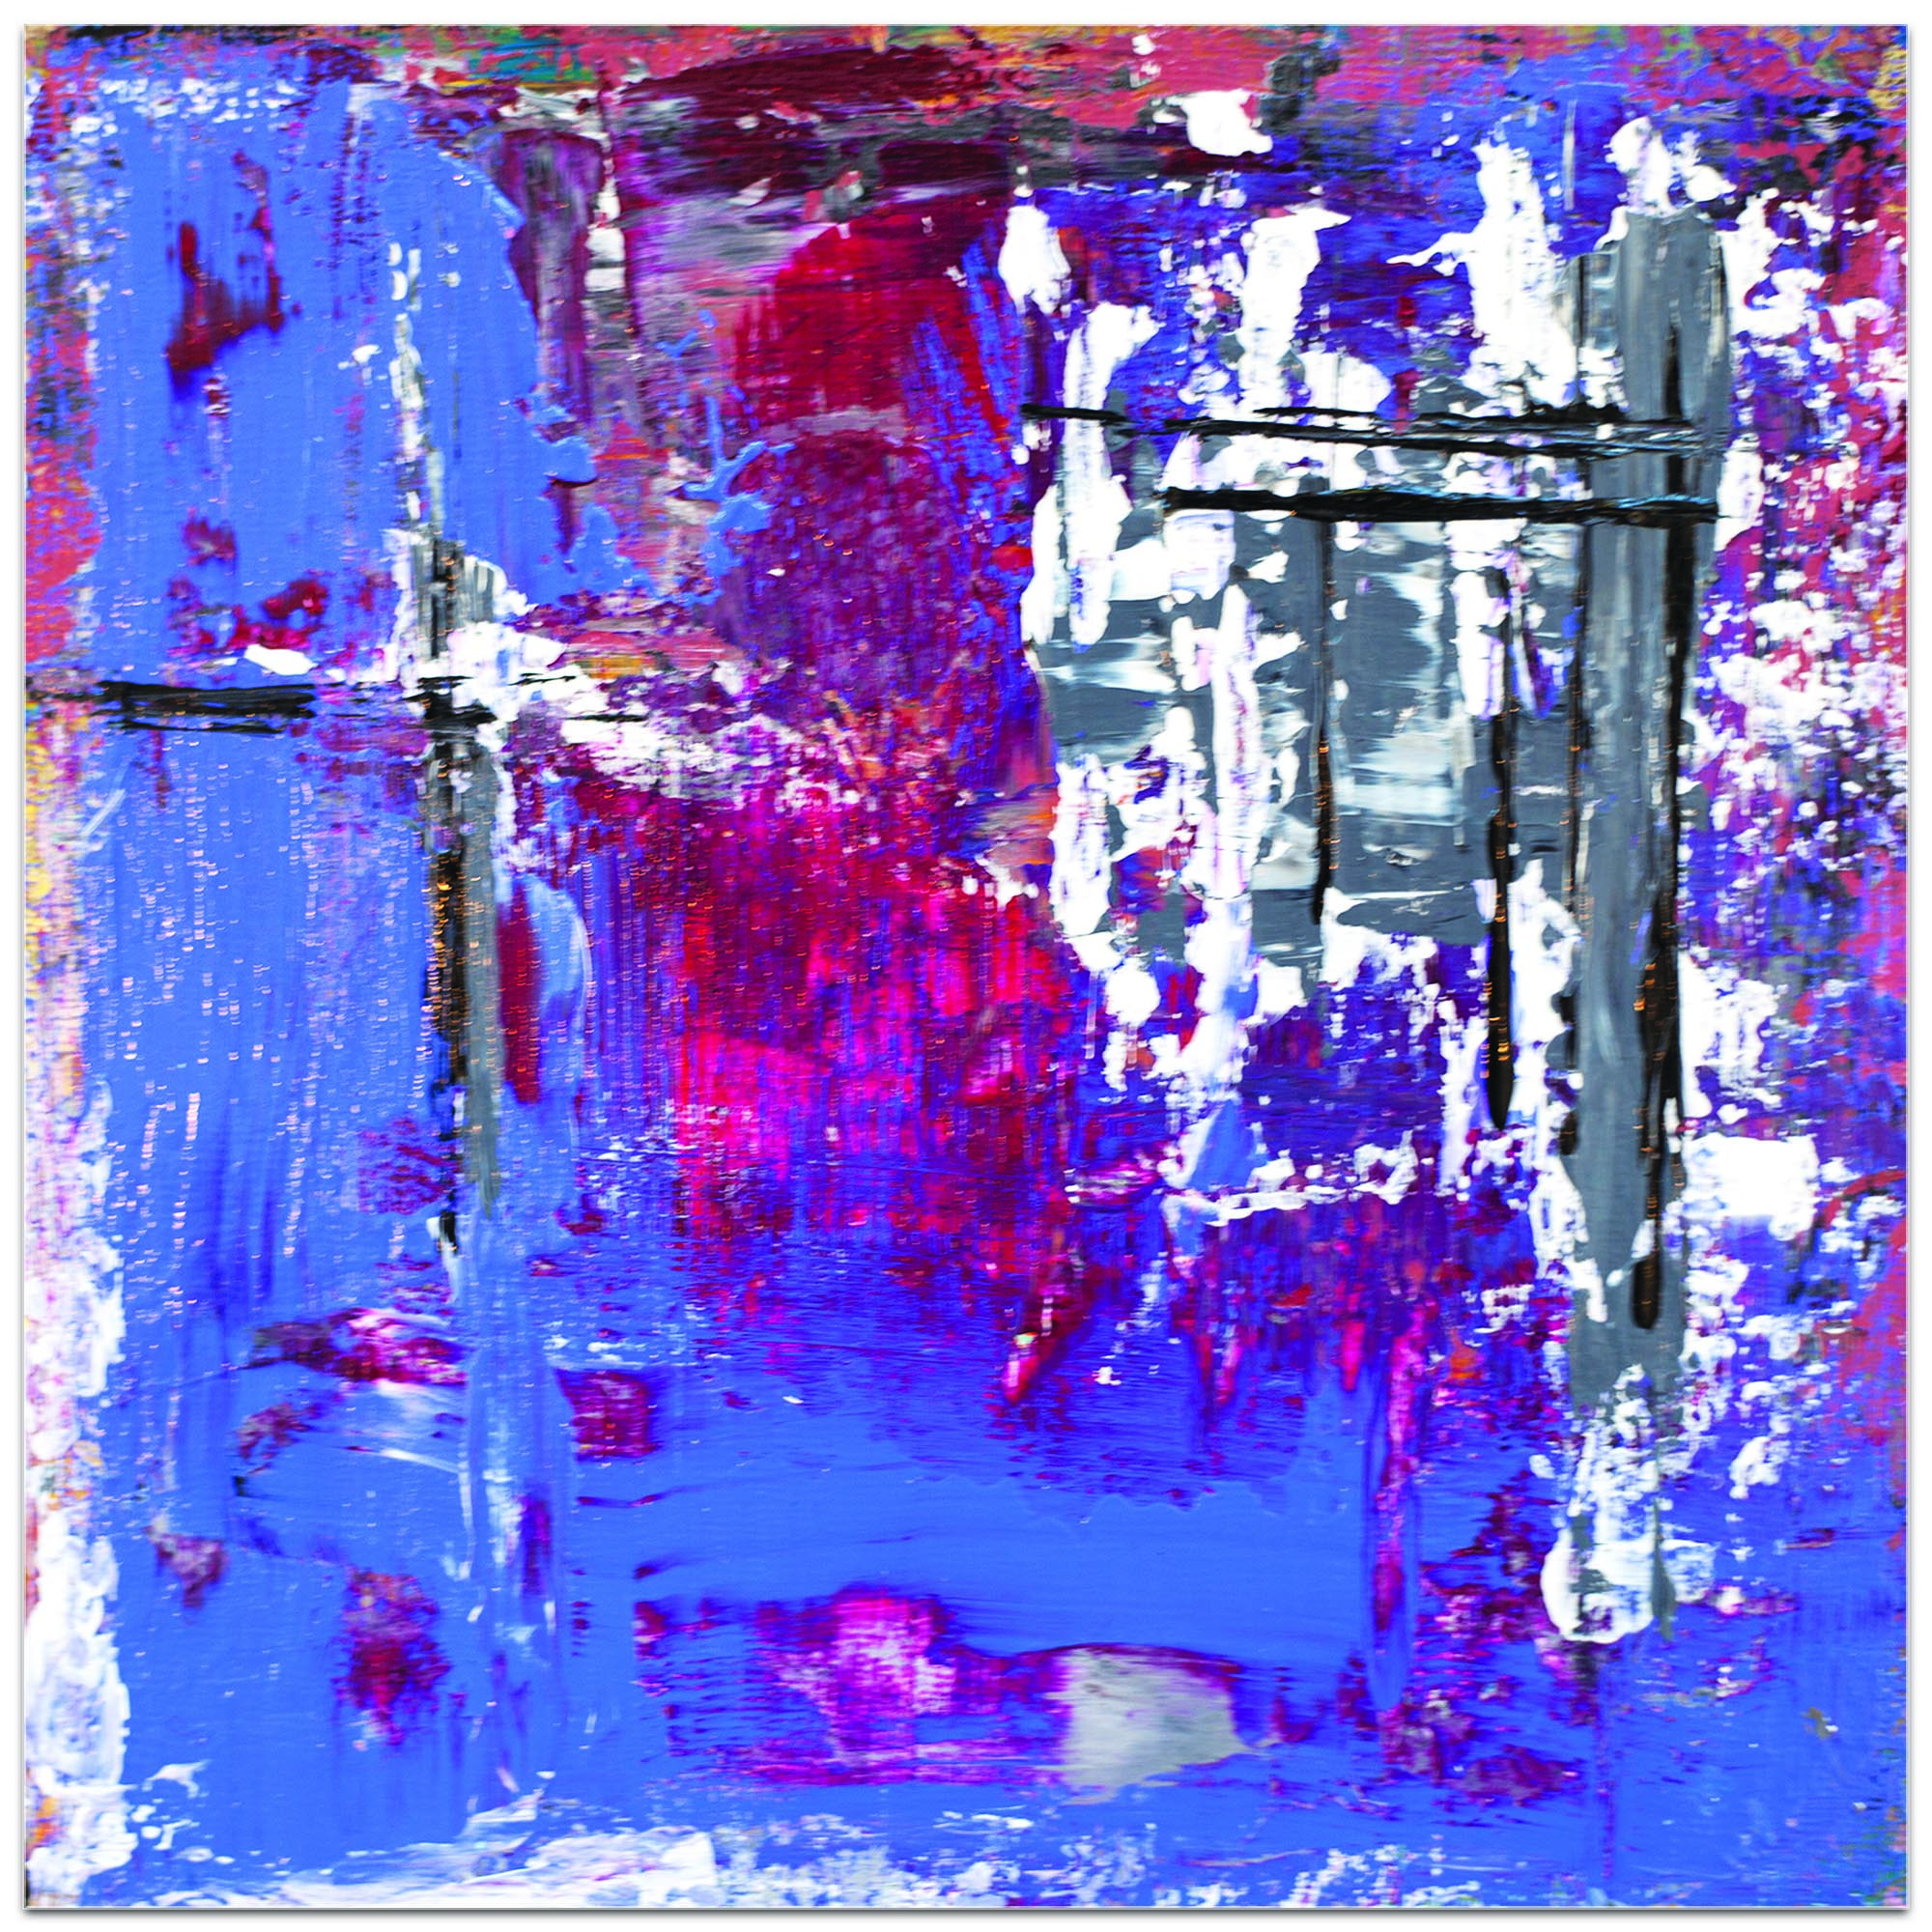 Abstract Wall Art 'Urban Life 7' - Urban Decor on Metal or Plexiglass - Image 2